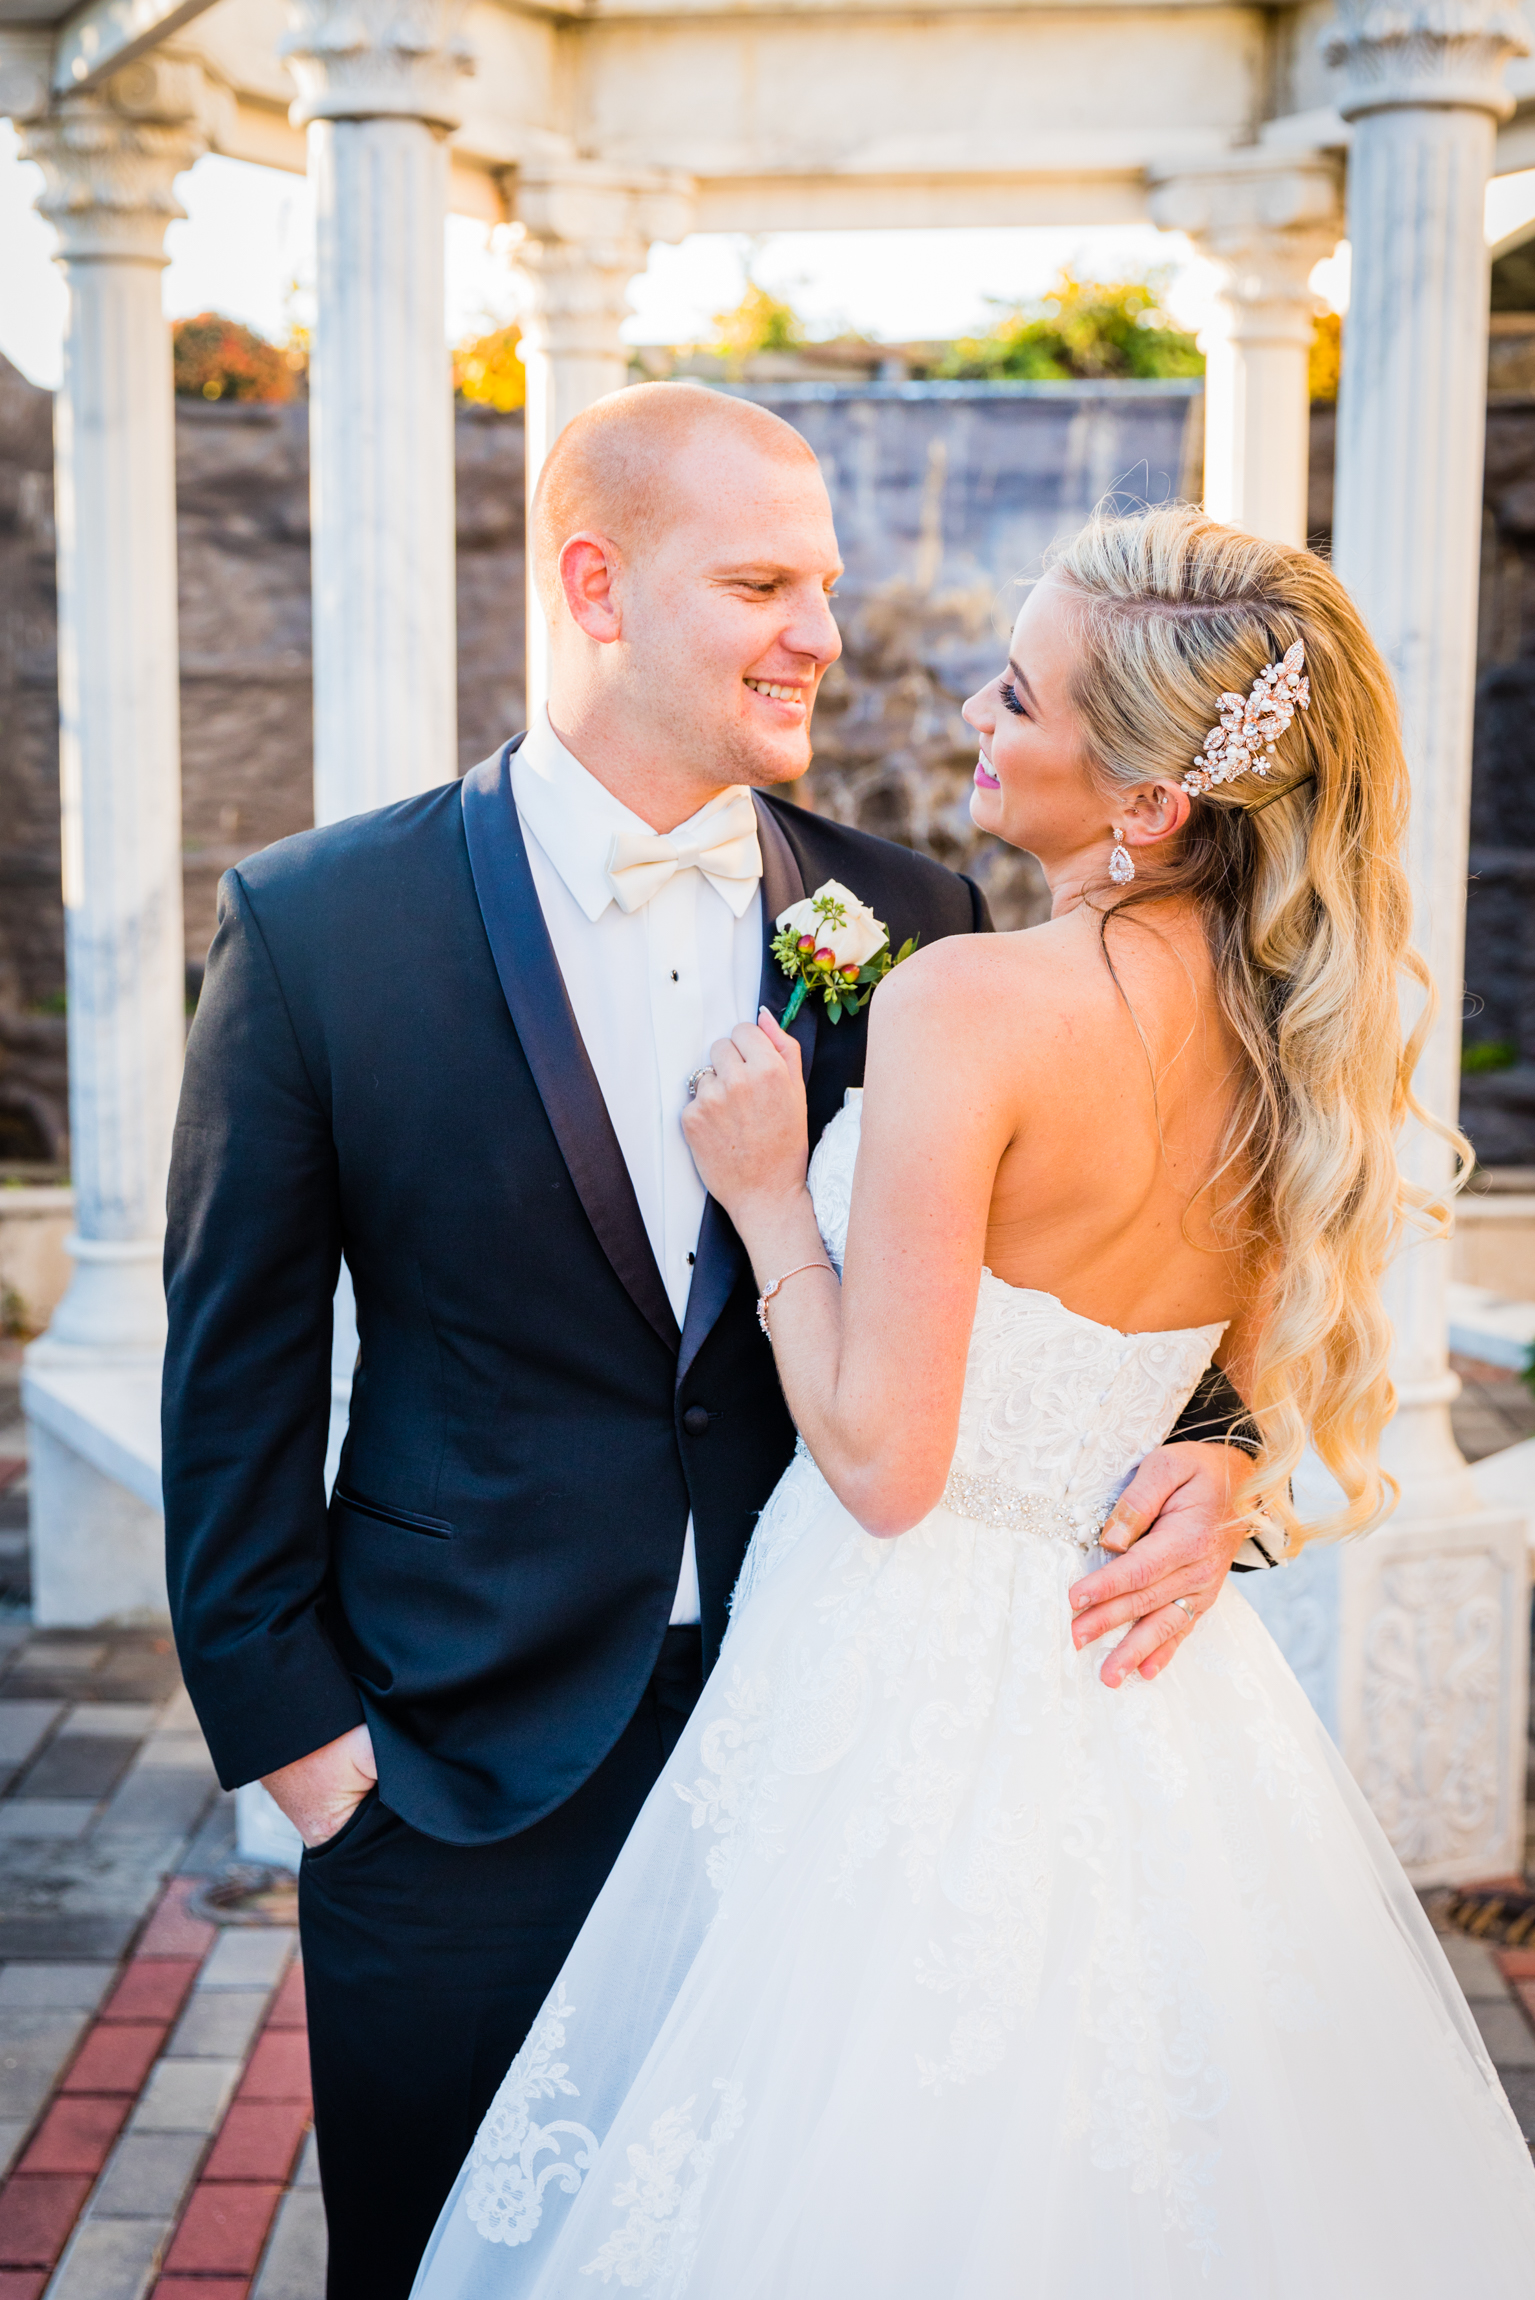 Luciens Manor - Wedding Photography -094.jpg